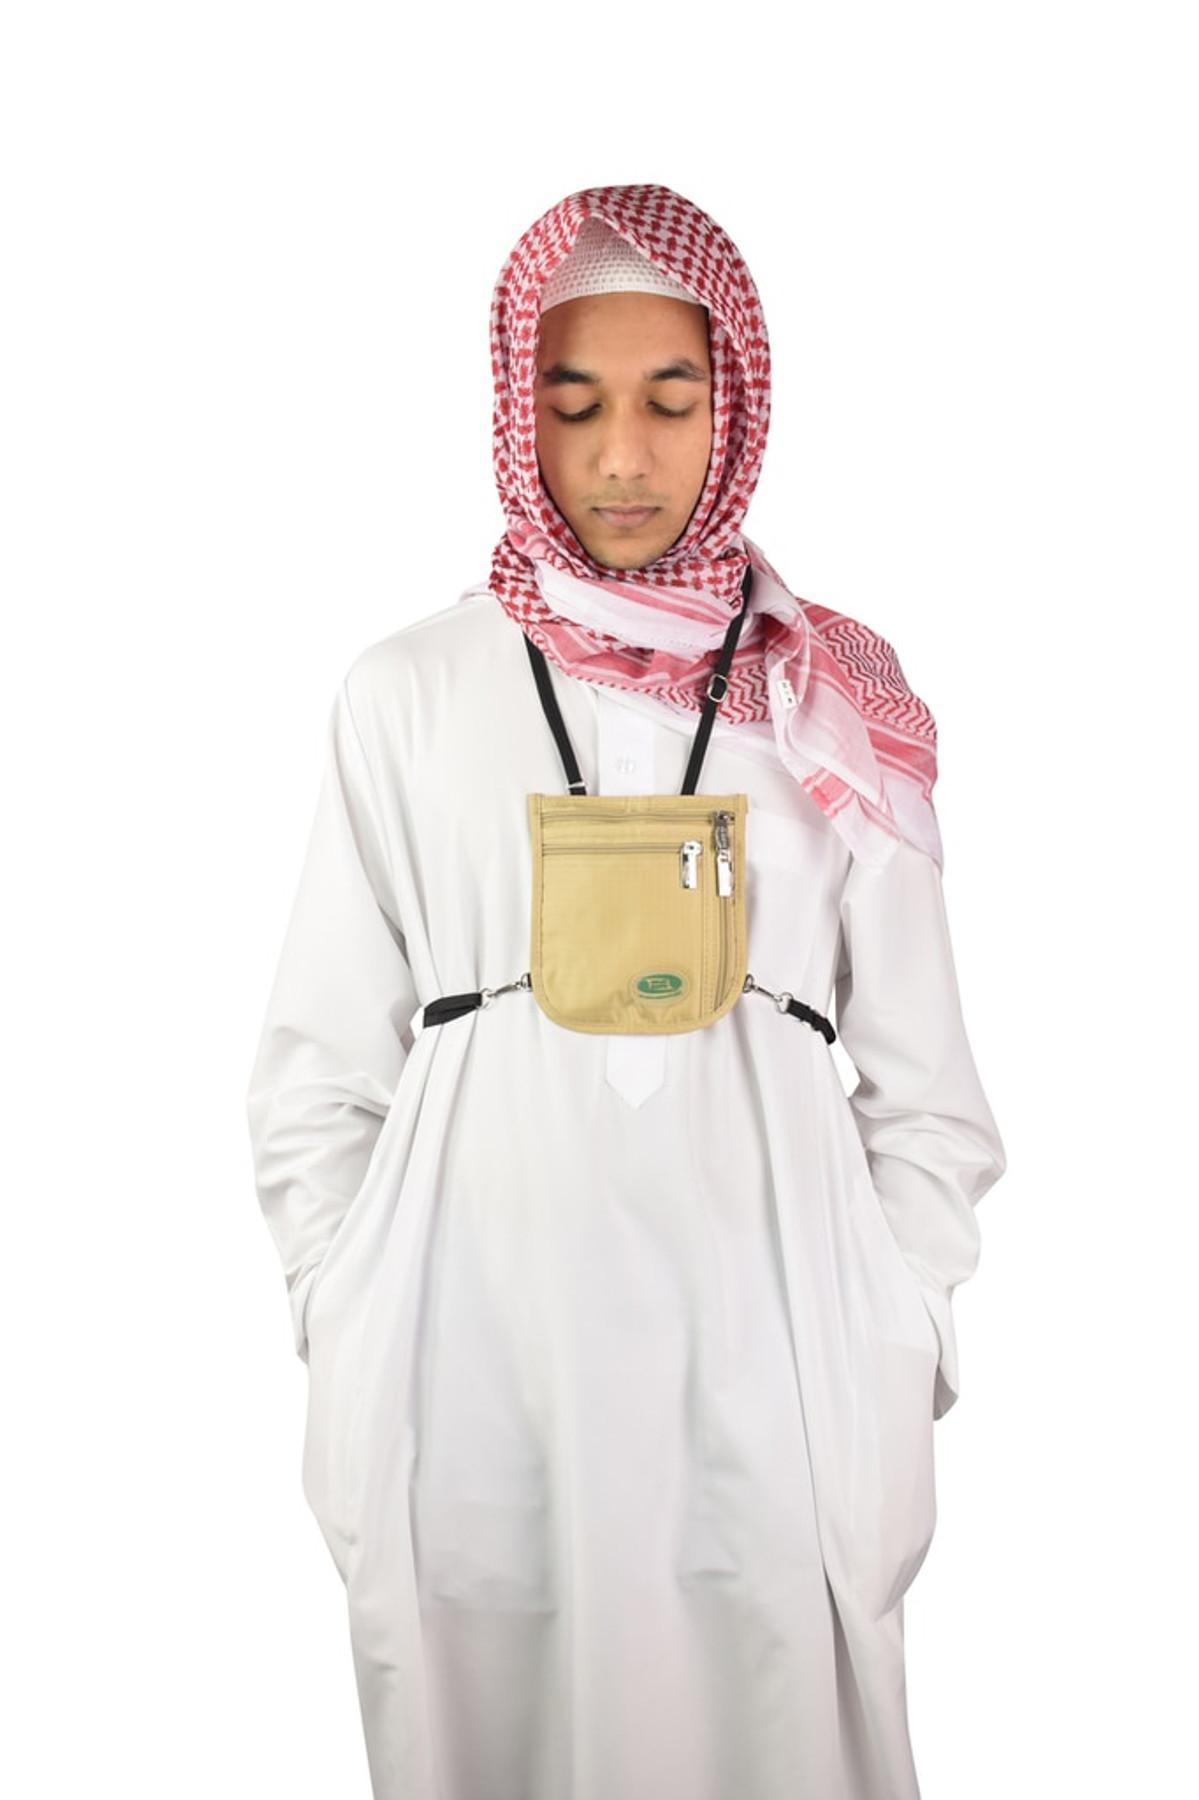 Hajj & Umrah - Secure Neck Bag